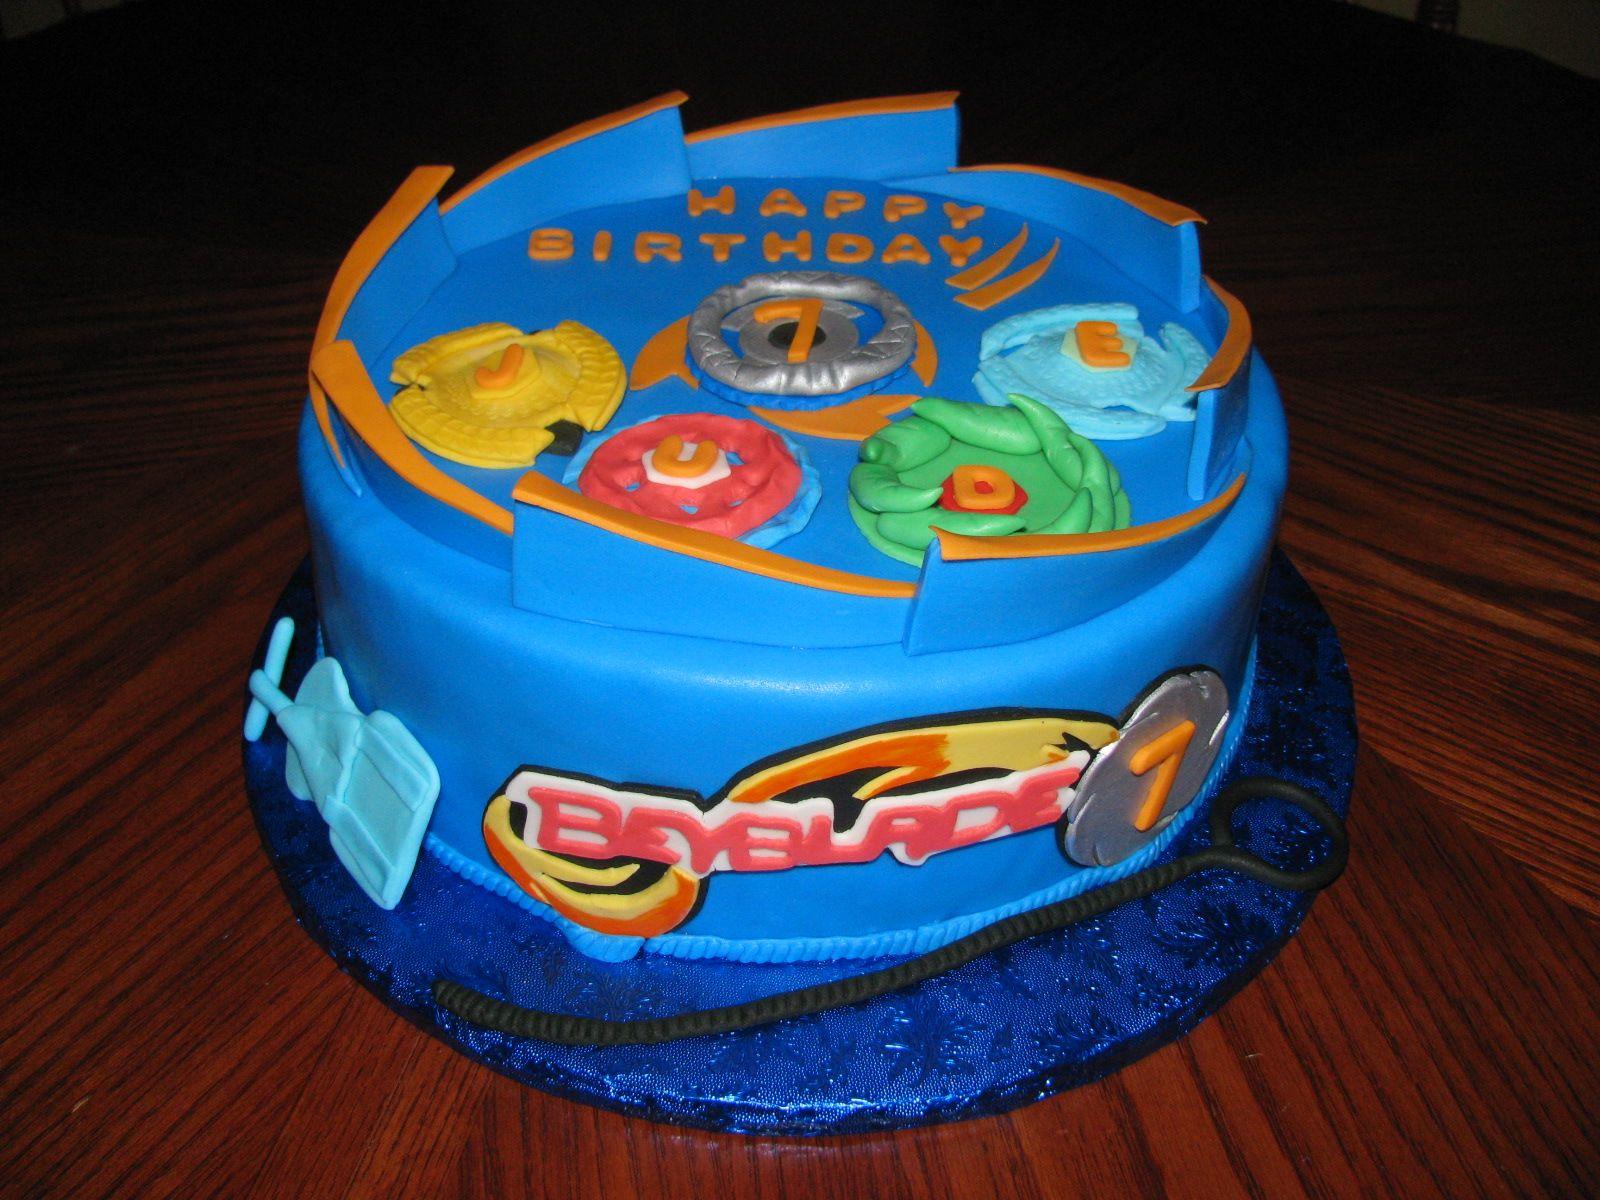 Children's Birthday Cakes - Beyblade birthday cake | Cakes in 2019 ...